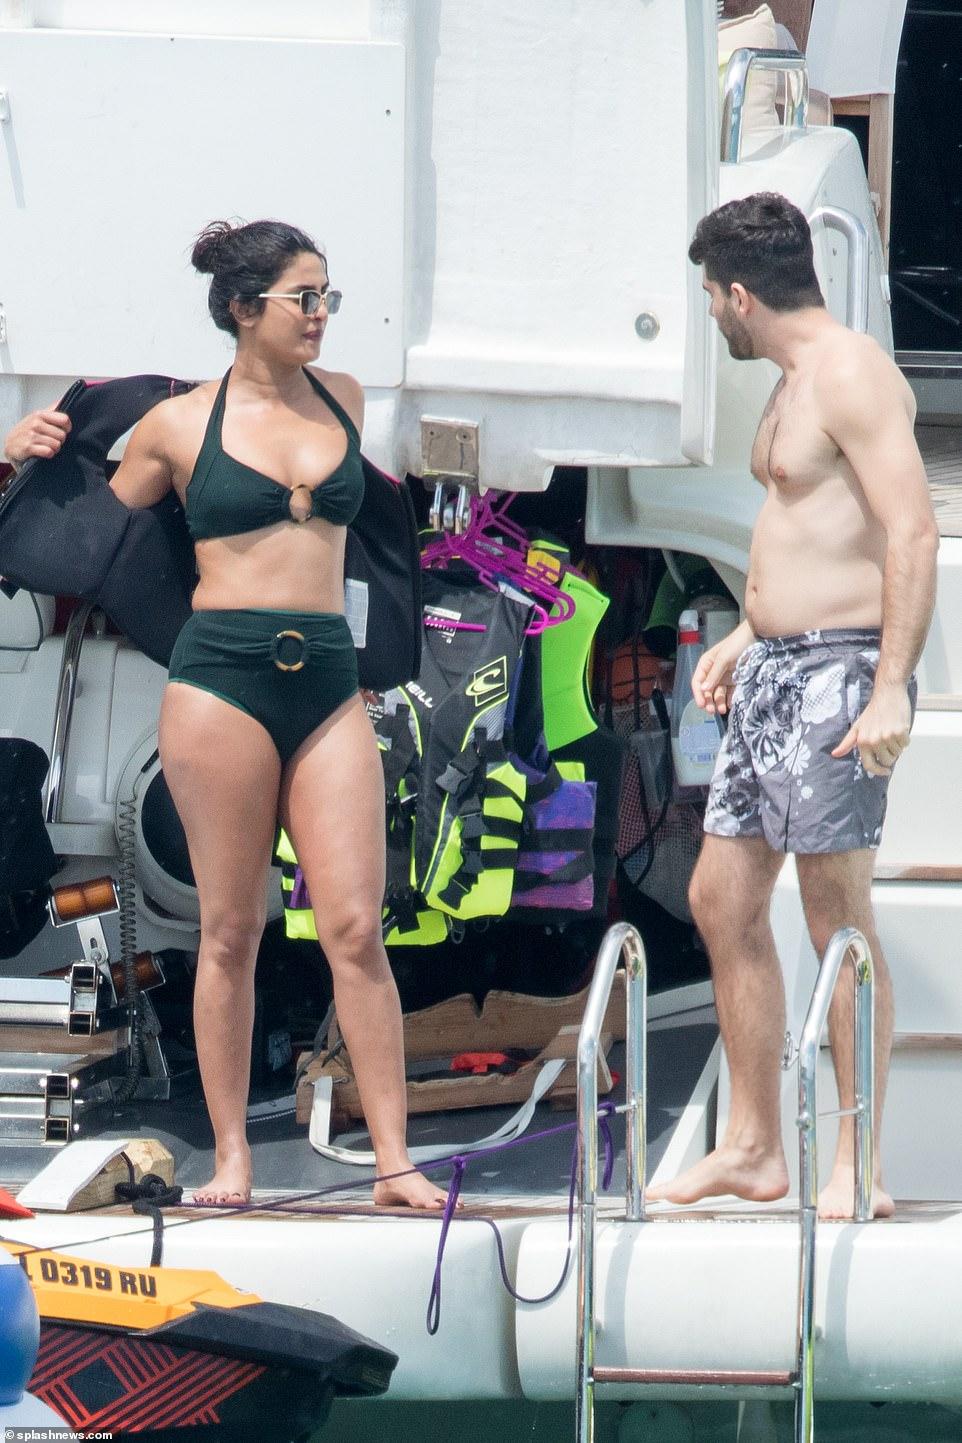 Priyanka Chopra shows off her incredible figure in chic green bikini